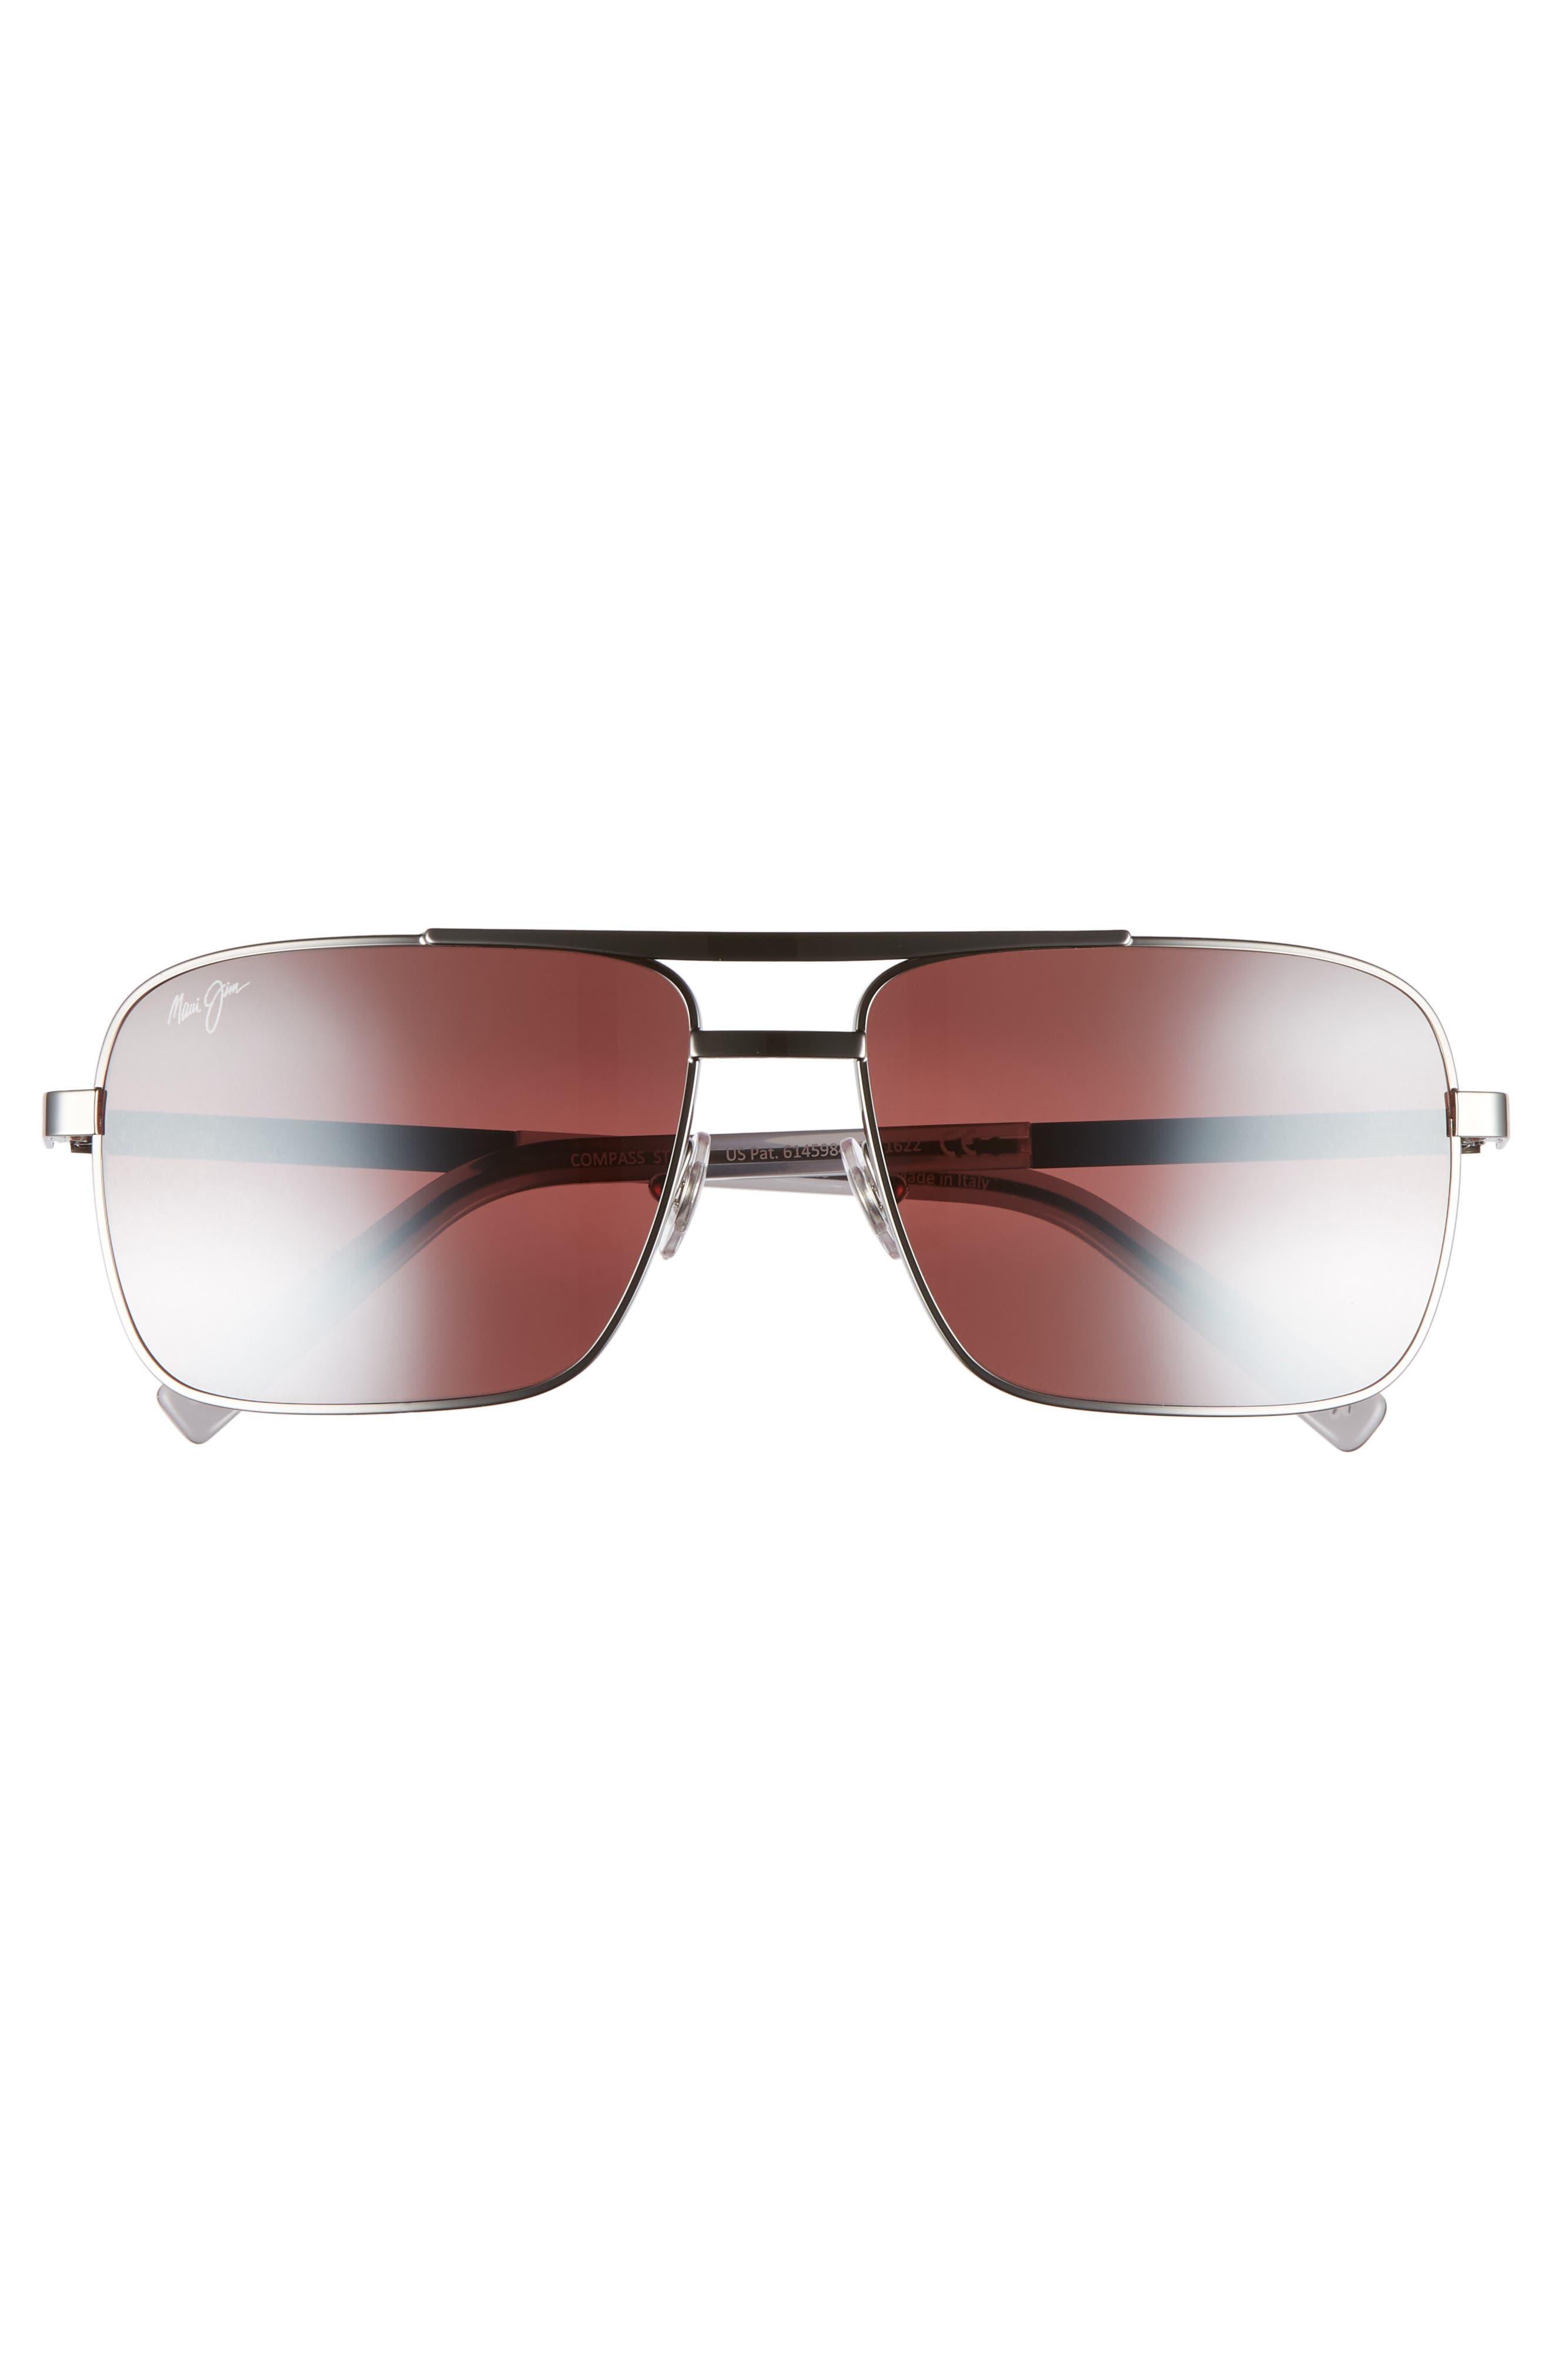 Compass 60mm Polarized Aviator Sunglasses,                             Alternate thumbnail 2, color,                             GUNMETAL/ MAUI ROSE